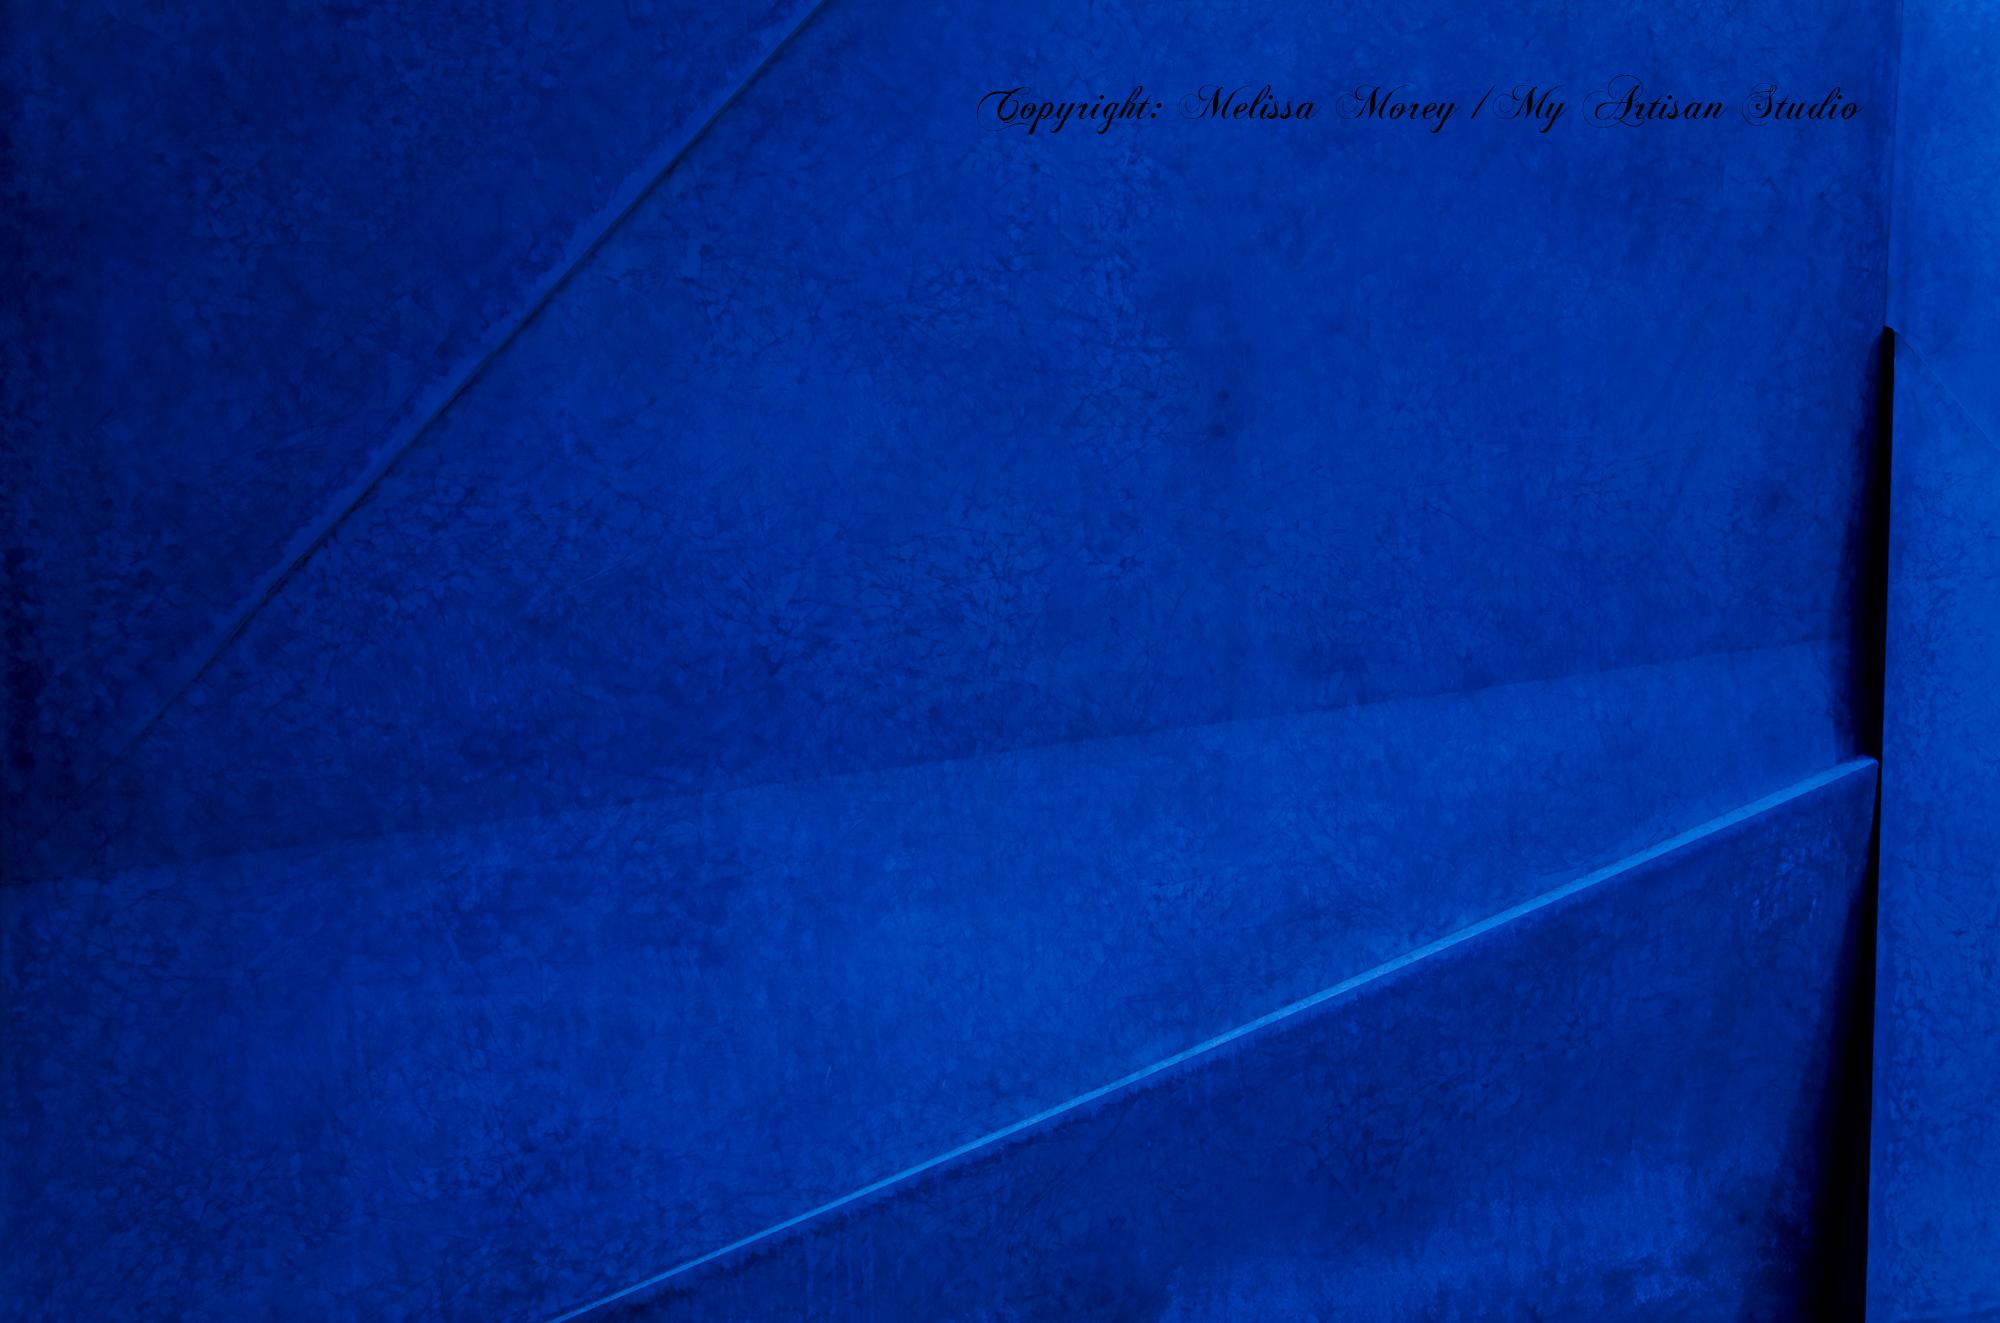 Photograph, photographic canvas art Hand Made Gifts Ballarat